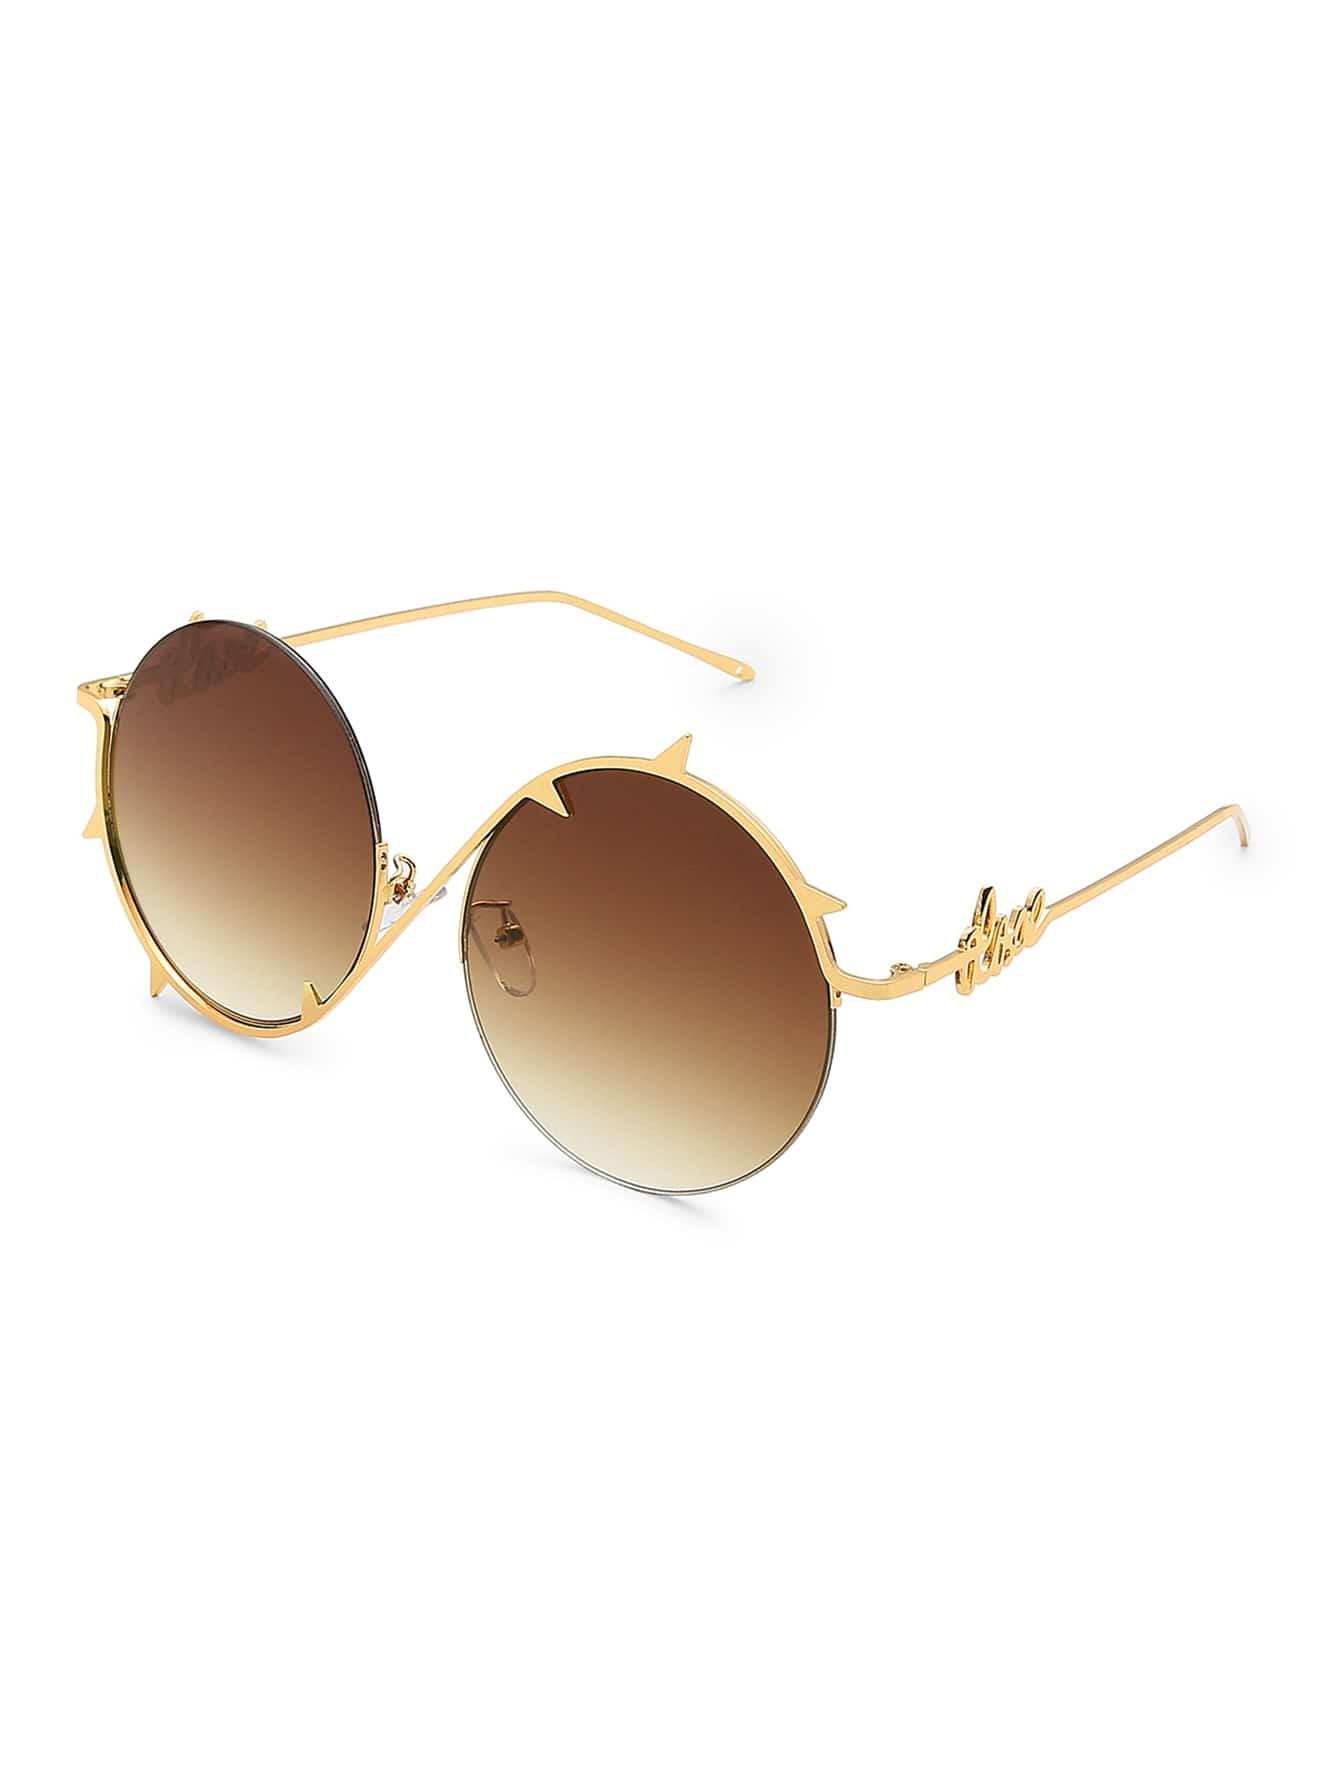 9da58b76bc9 Ombre Lens Asymmetrical Frame Round Sunglasses EmmaCloth-Women Fast ...